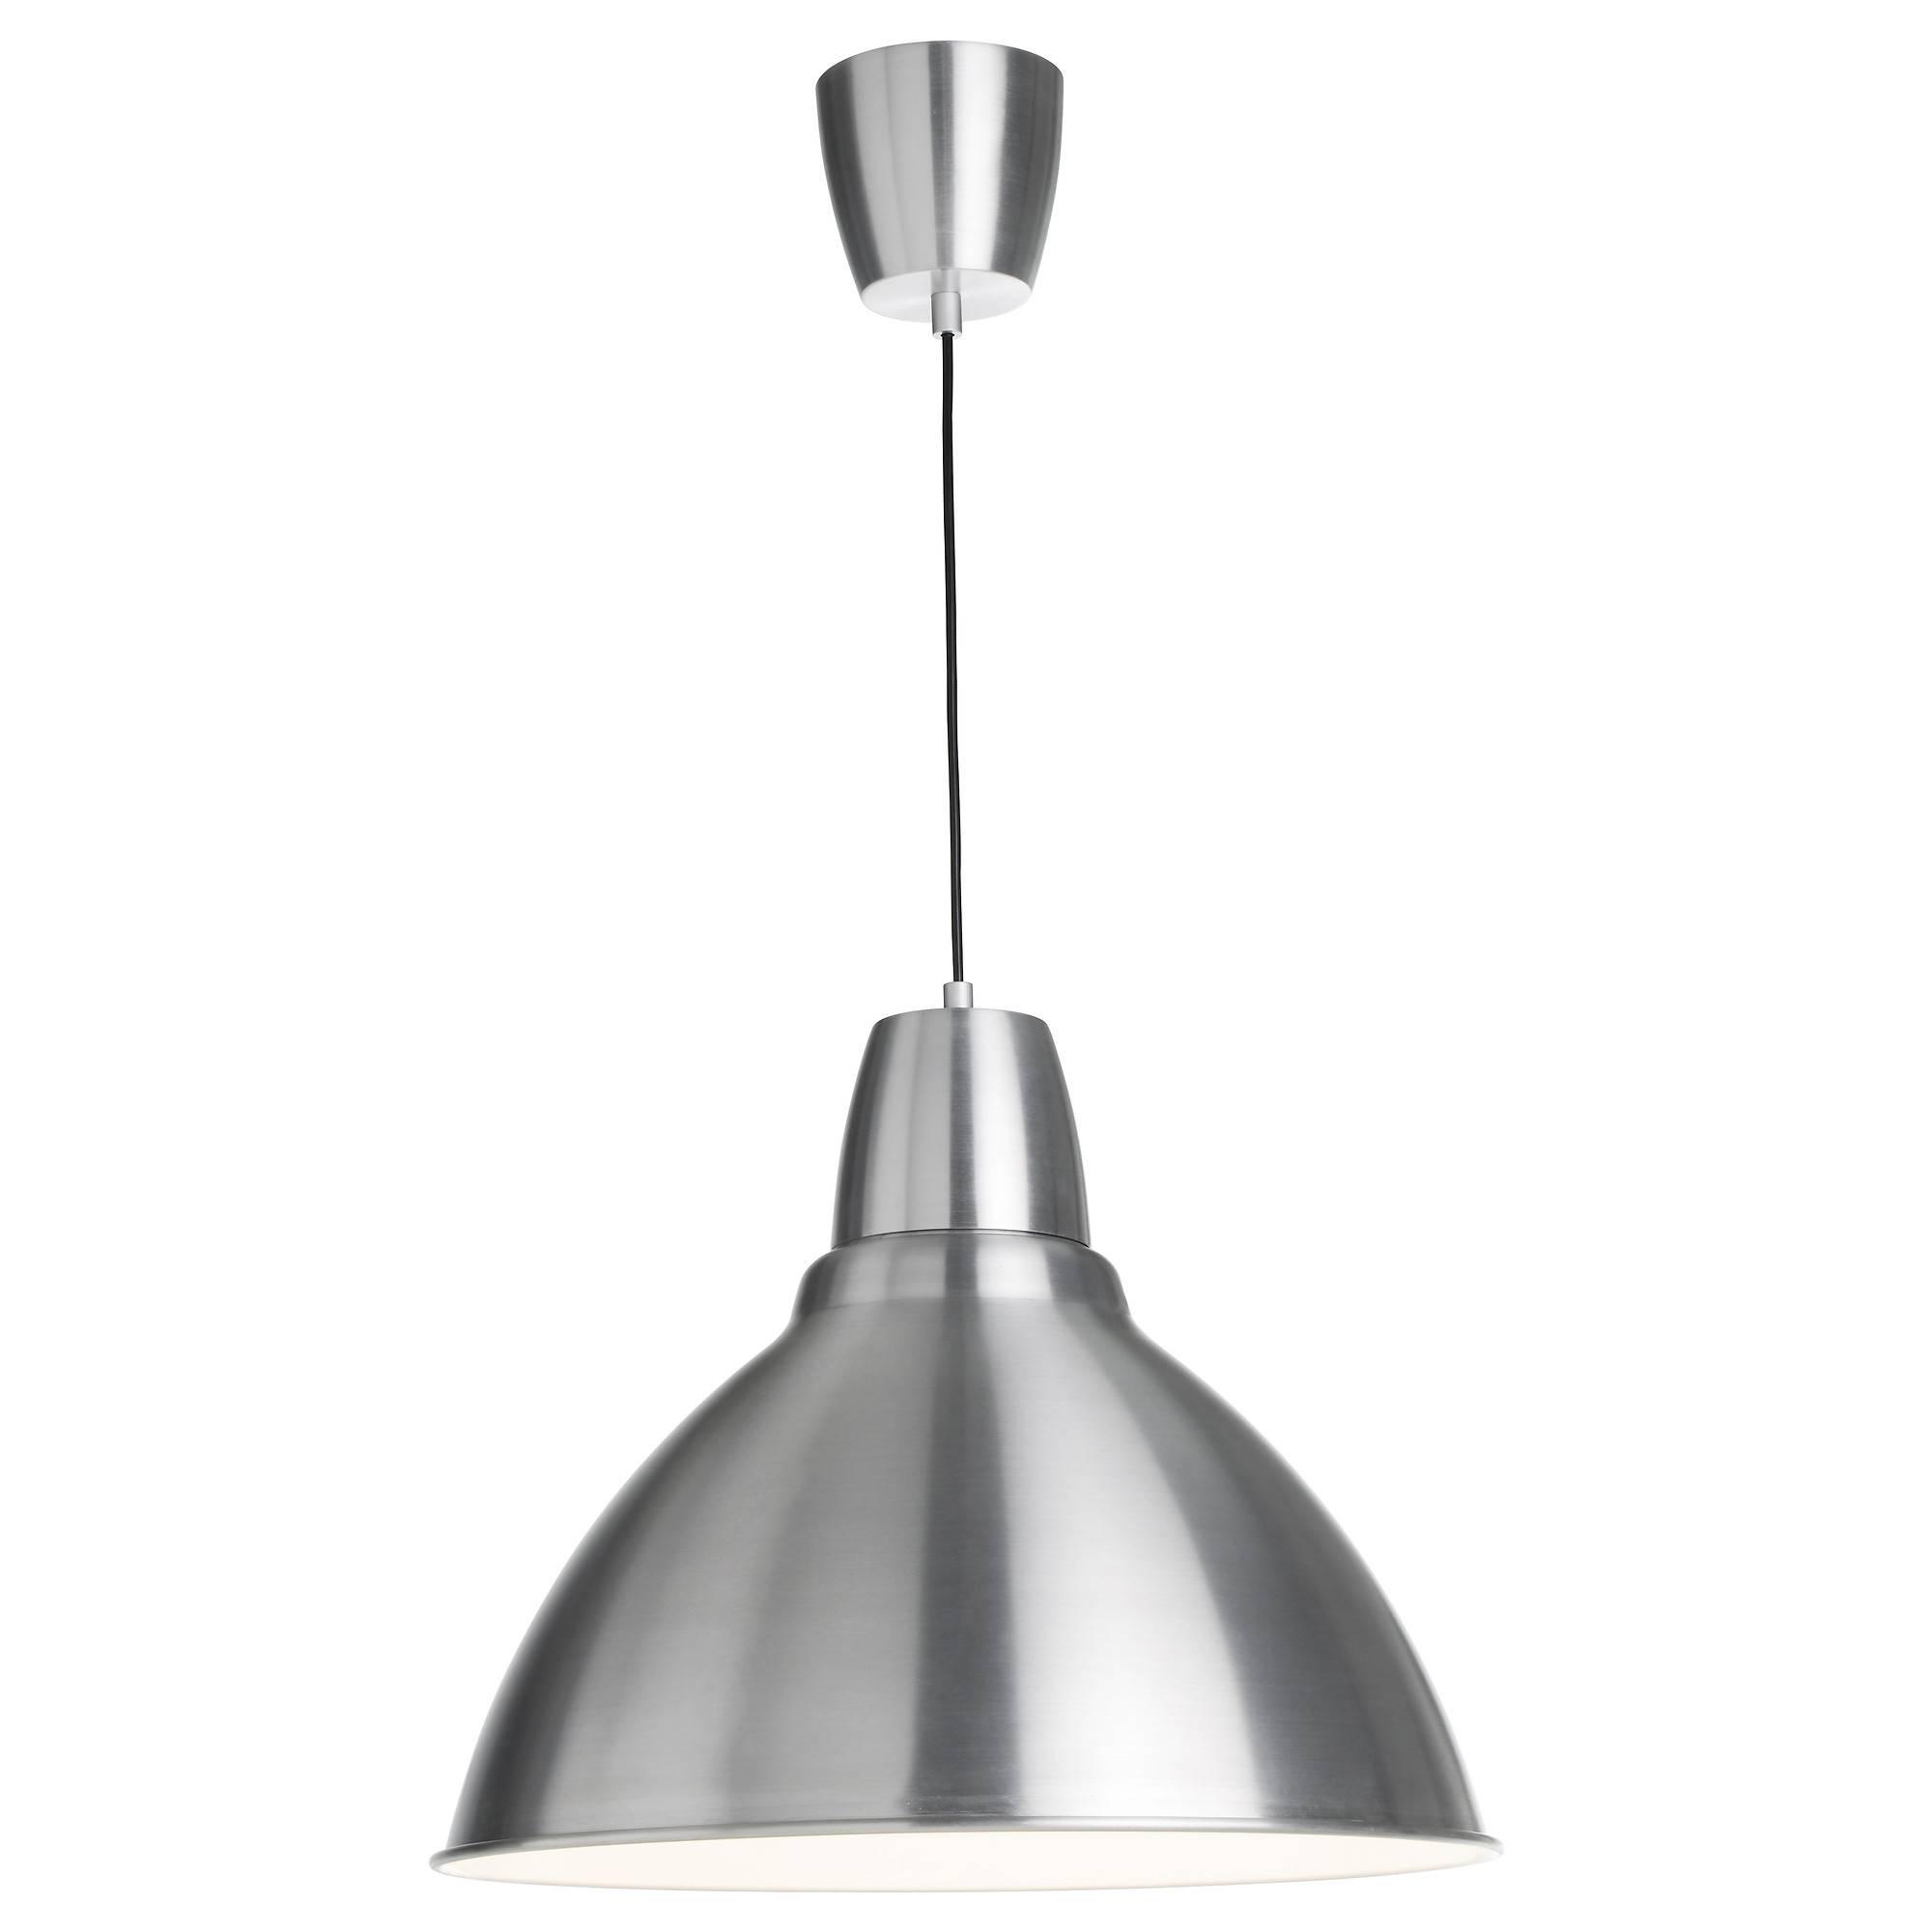 Foto Pendant Lamp – 50 Cm – Ikea Pertaining To Ikea Pendant Lights Fixtures (View 4 of 15)